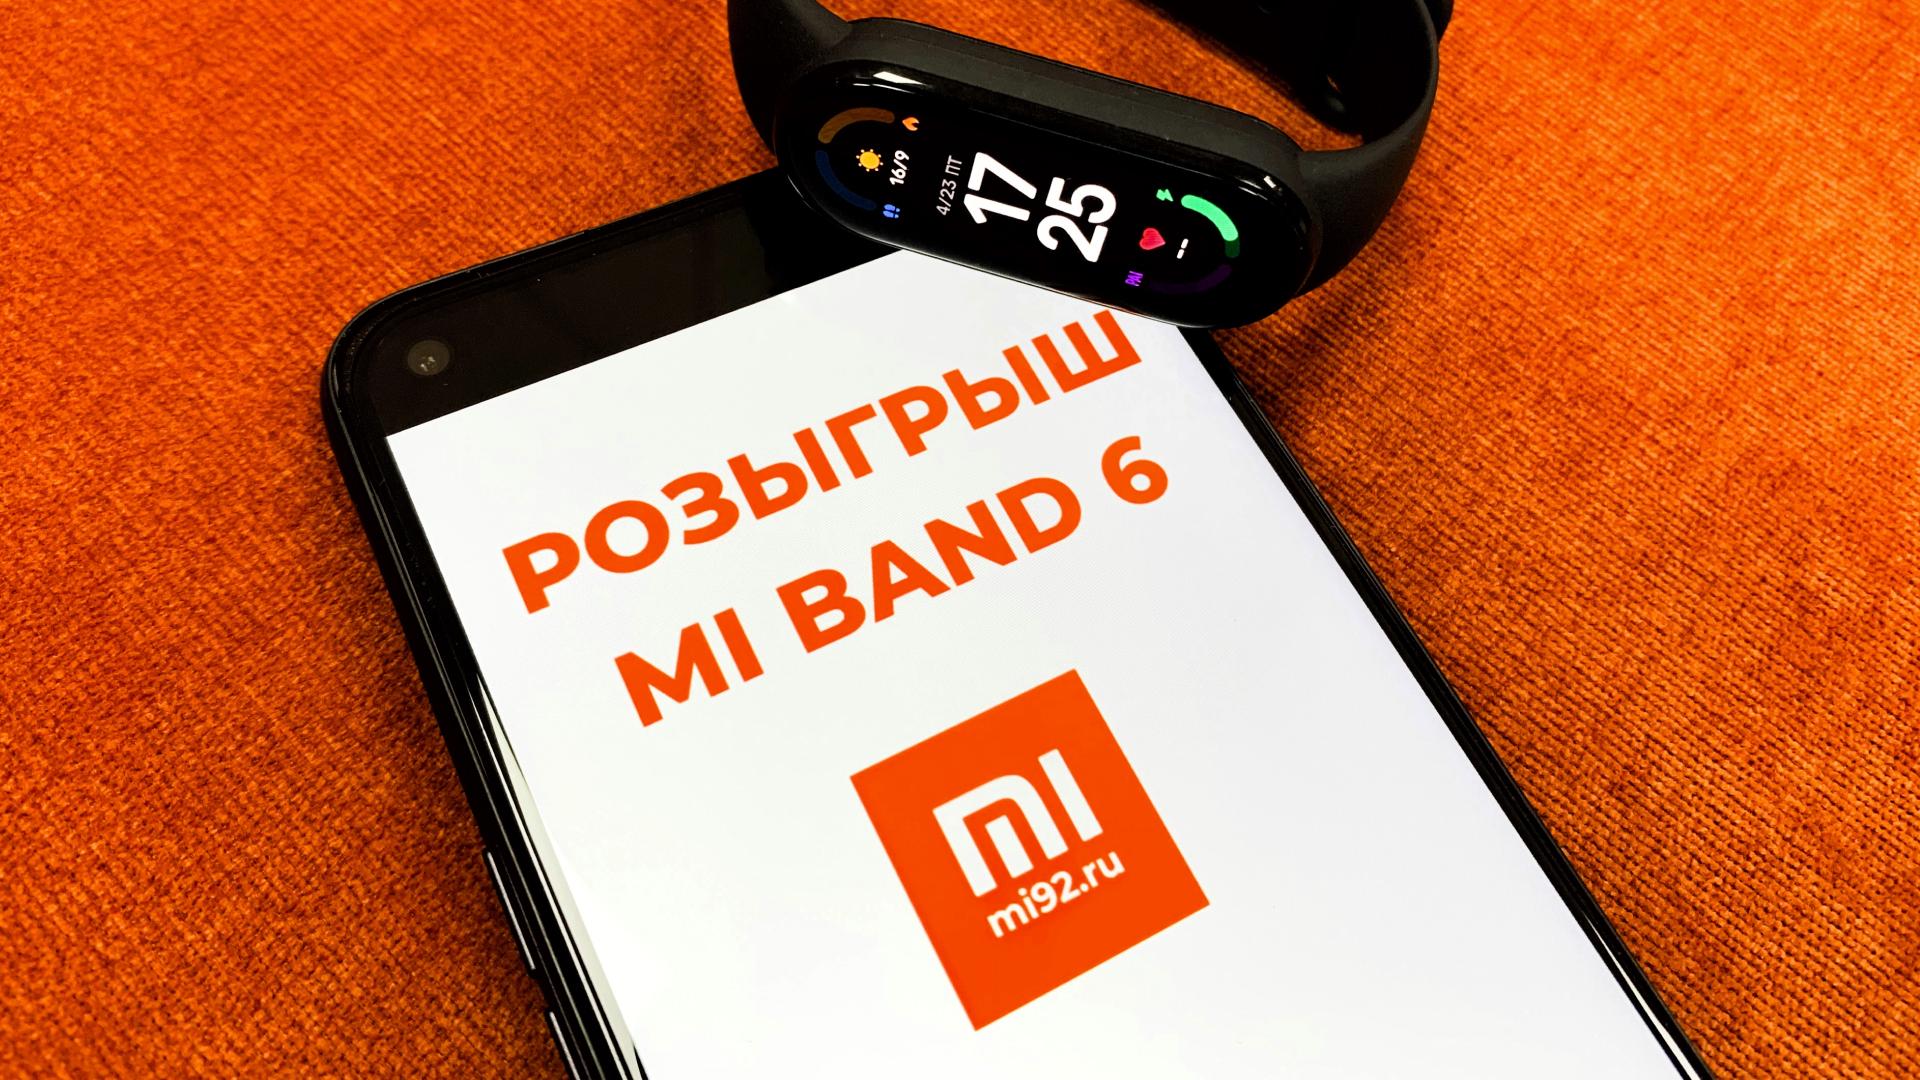 Mi Band 6 Rozygrysh Banner Promo